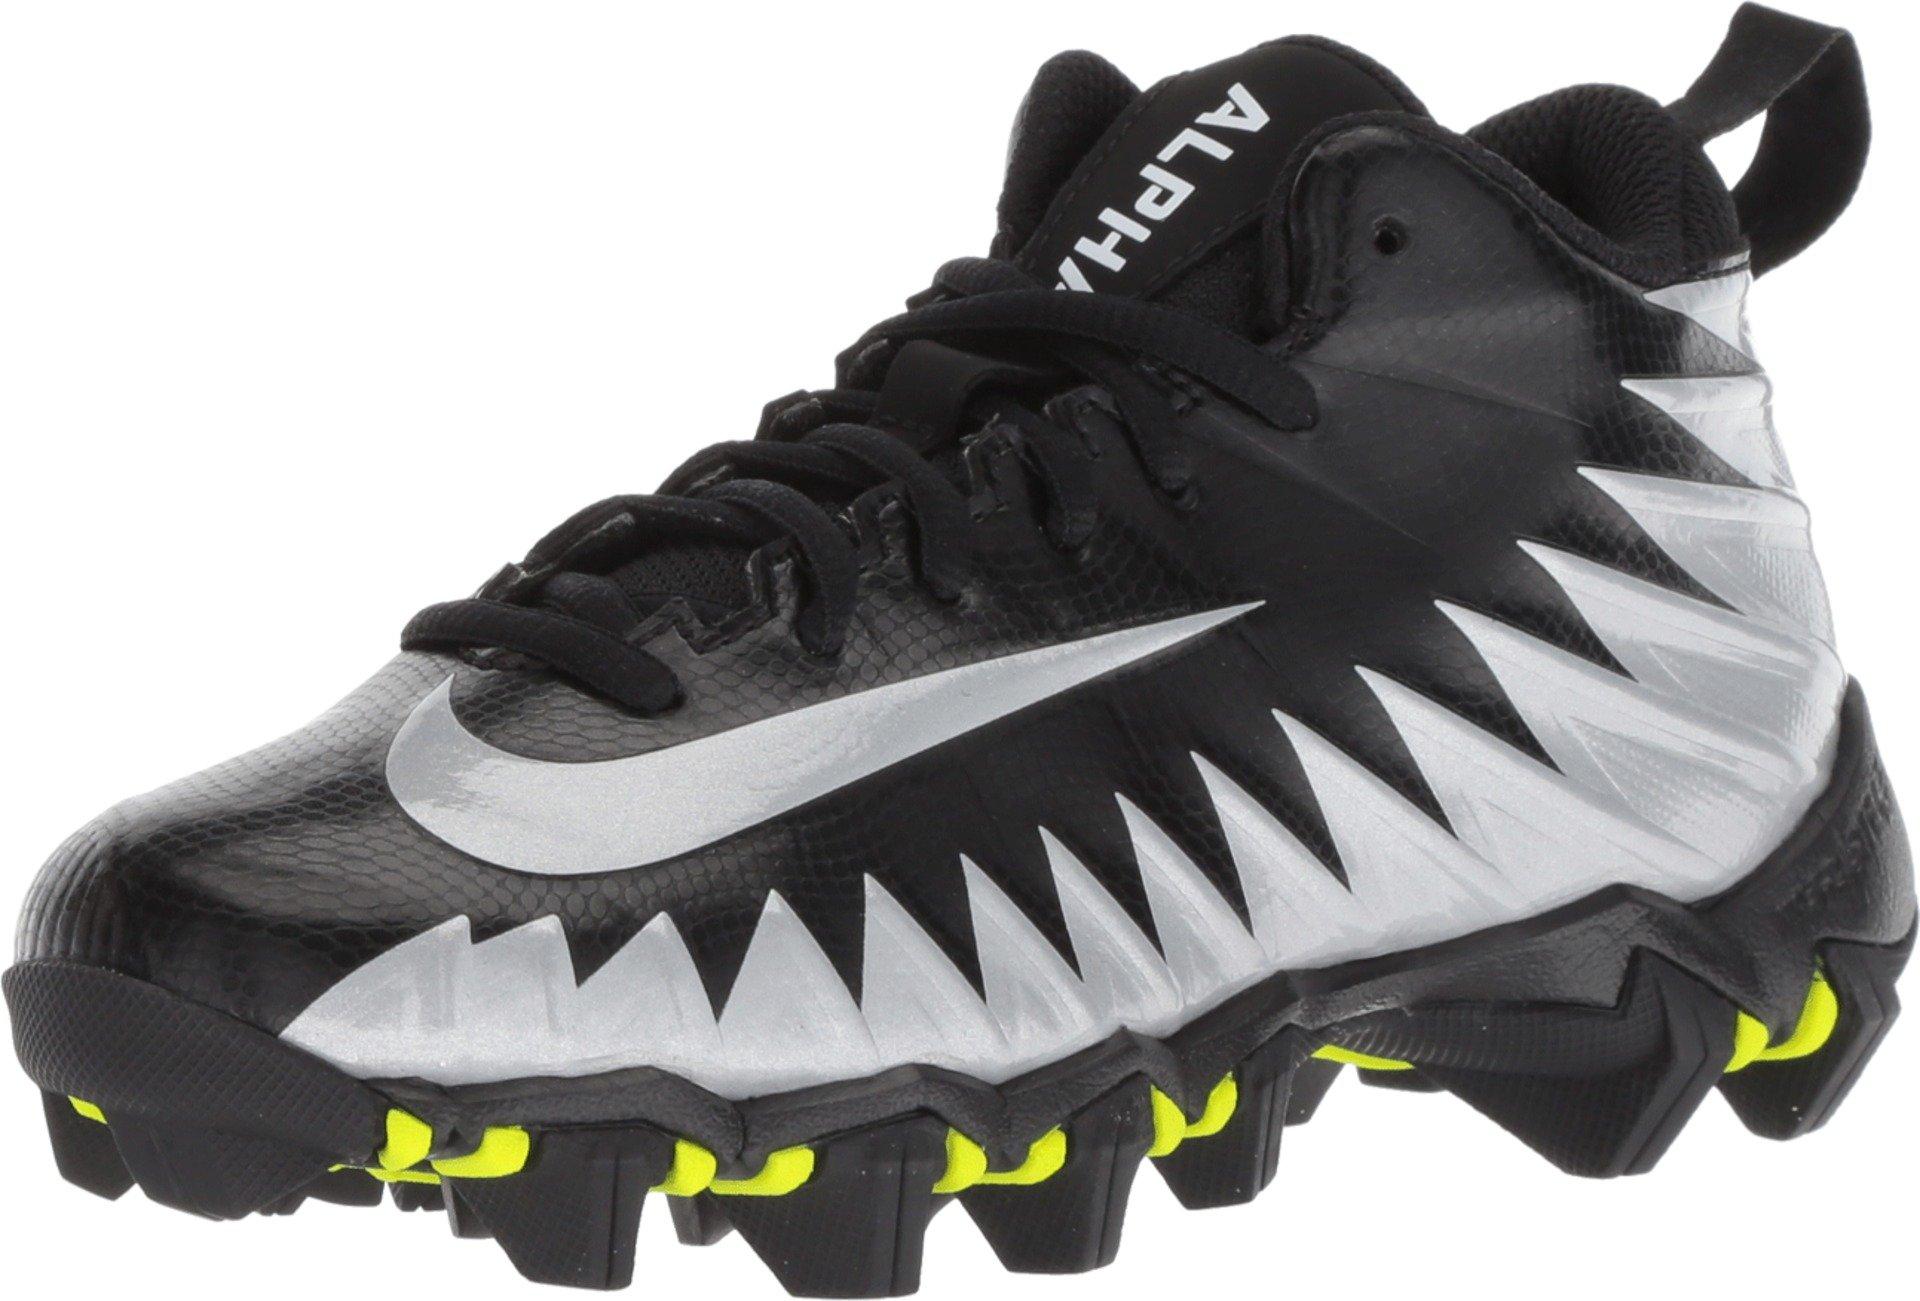 Nike Boy's Alpha Menace Shark (GS) Football Cleat Black/Metallic Silver/White Size 6 M US by Nike